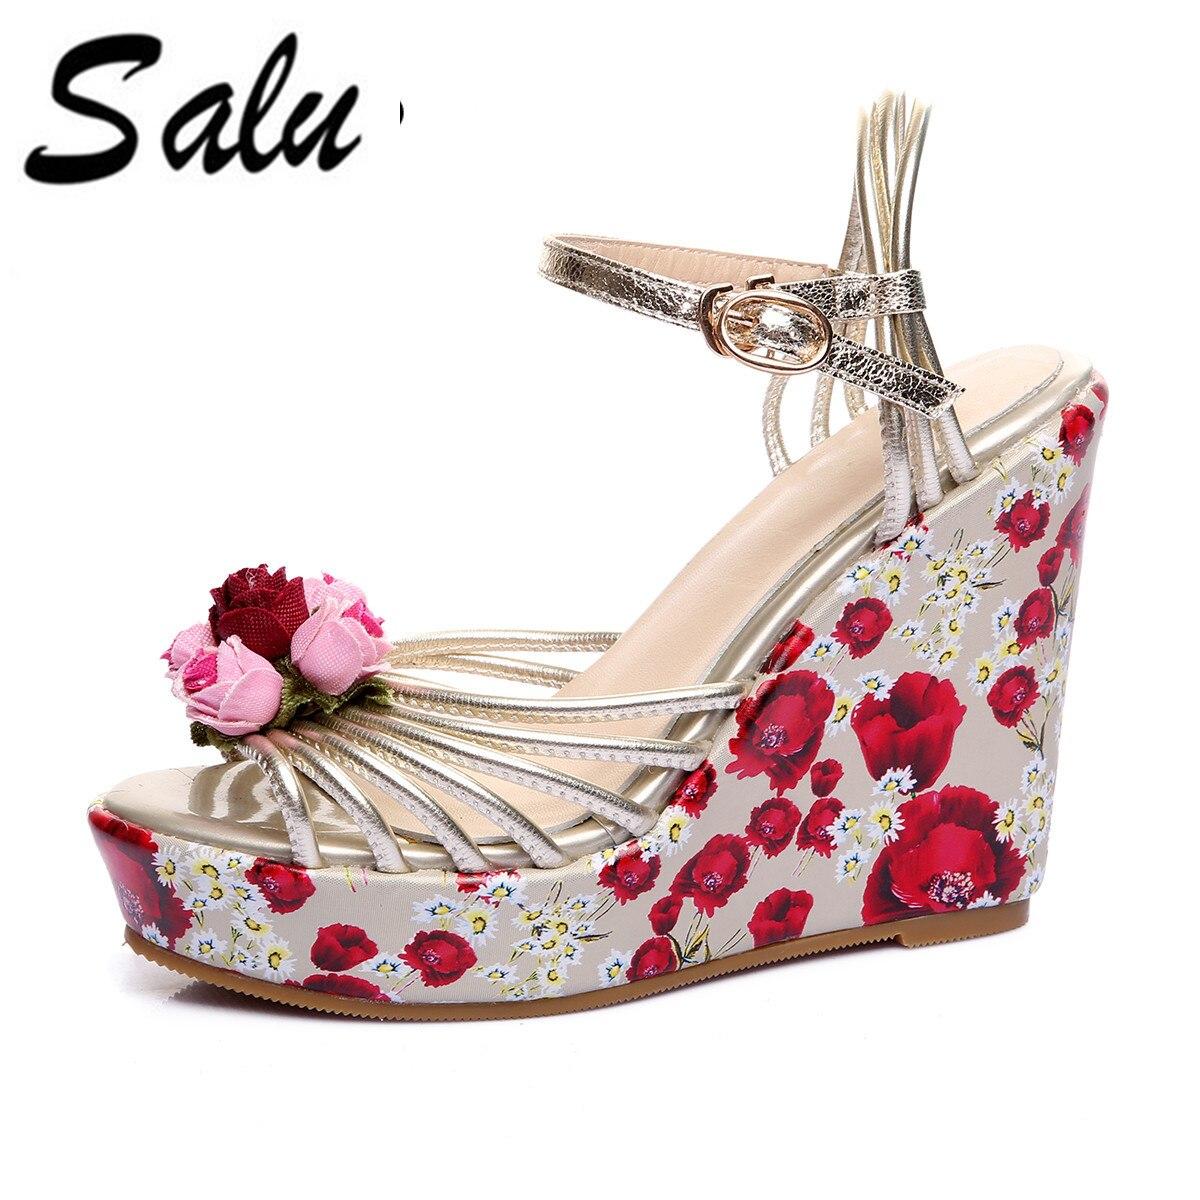 Salu 2018 new Women Sandals summer Wedge High Heel Platform Women Shoes  Slingback Genuine Leather Ladies Wedding Shoes 6e36f5b48d54